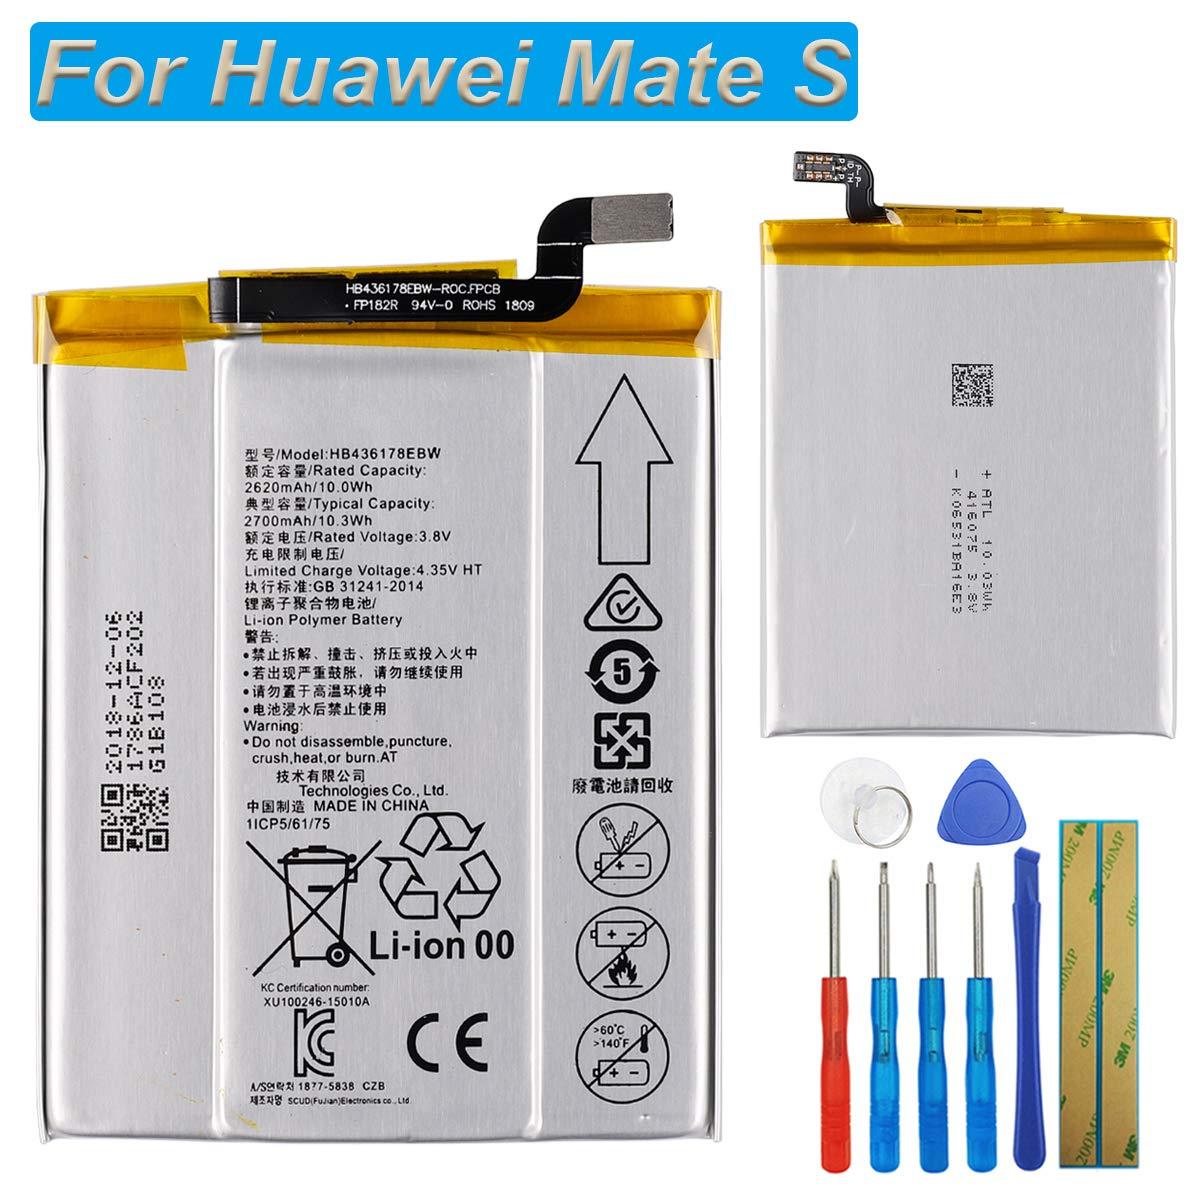 Bater/ía de Repuesto para Huawei Mate S CRR-CL00 CRR-CL20 CRR-L09 CRR-UL00 E2629 con Herramientas E-yiviil HB436178EBW